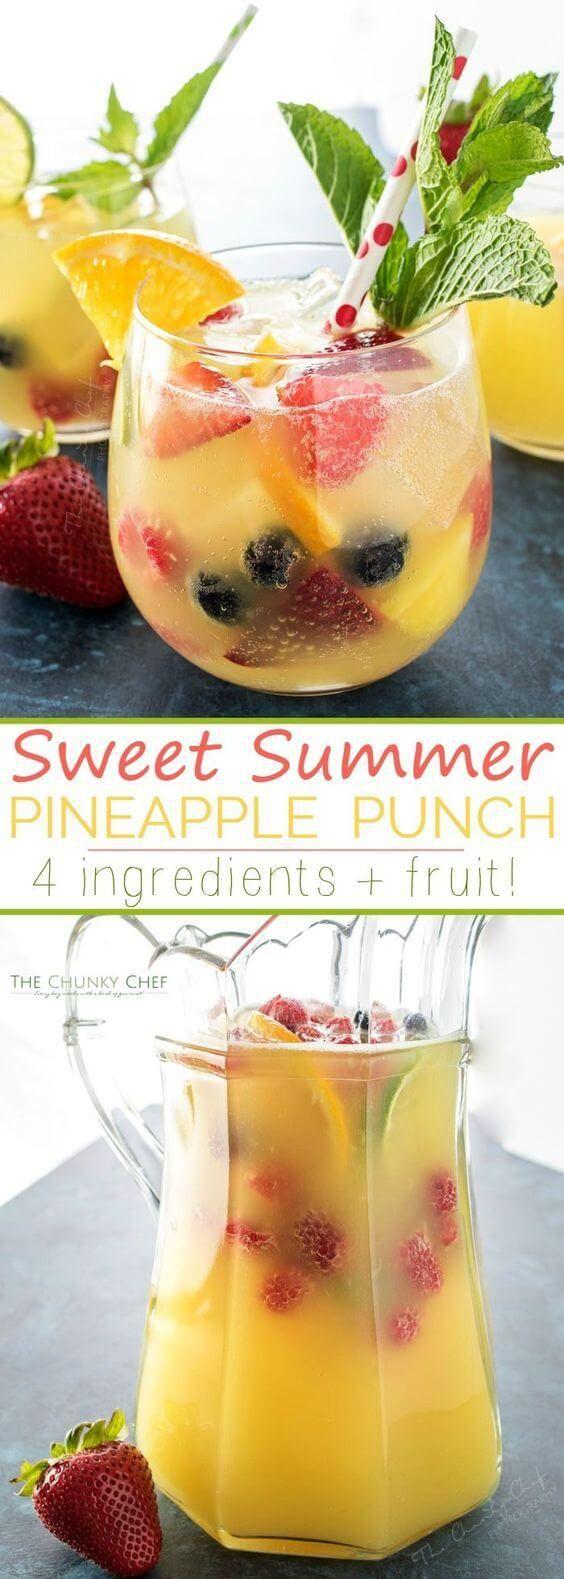 Sangria Fruitsicles advise